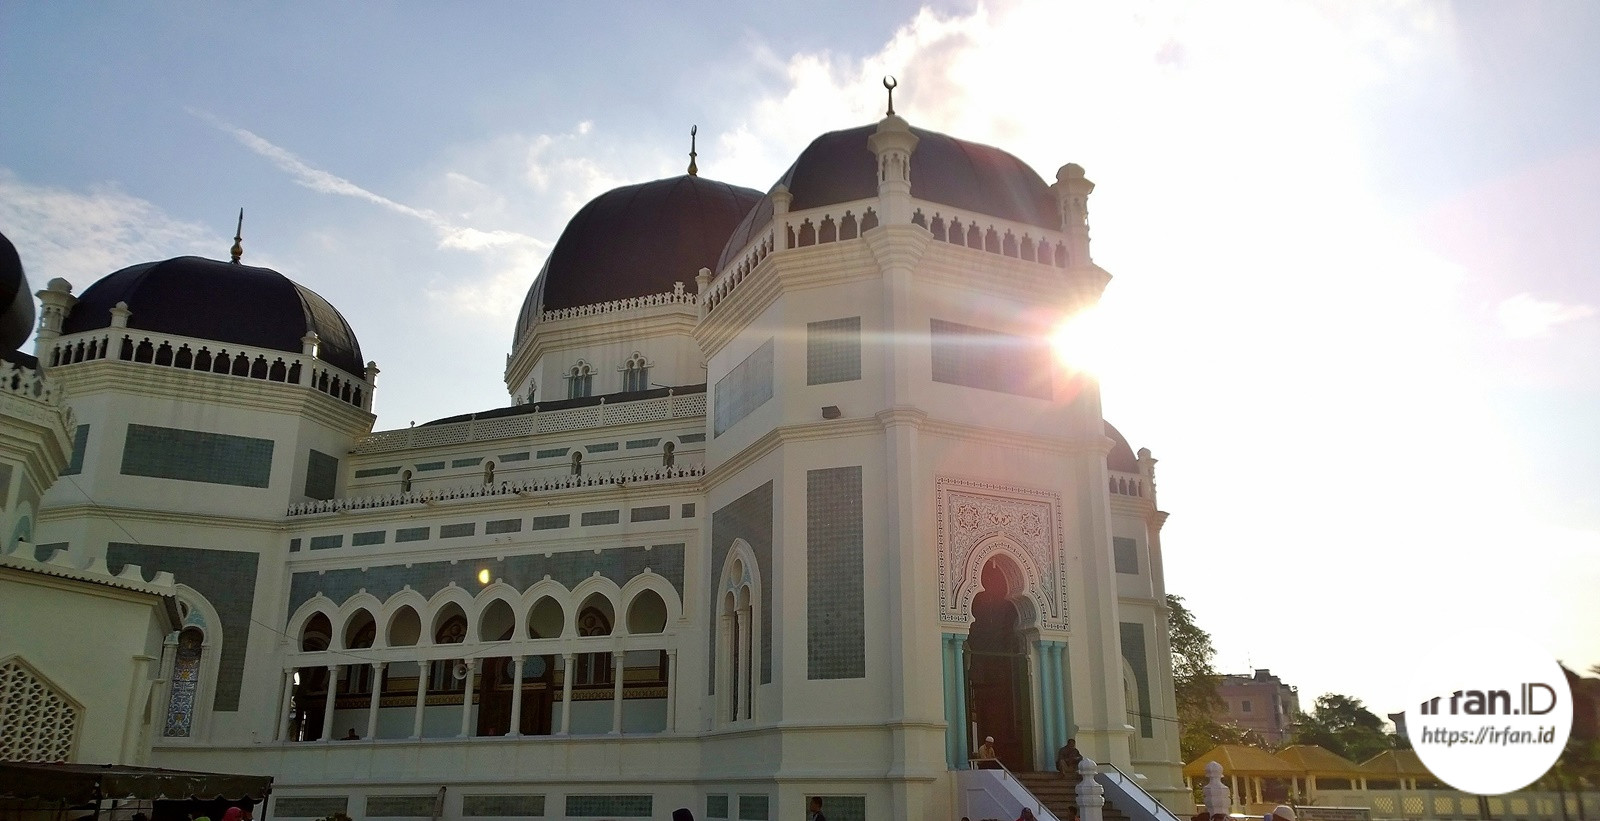 Tampak depan Masjid Raya Al-Mashun Medan